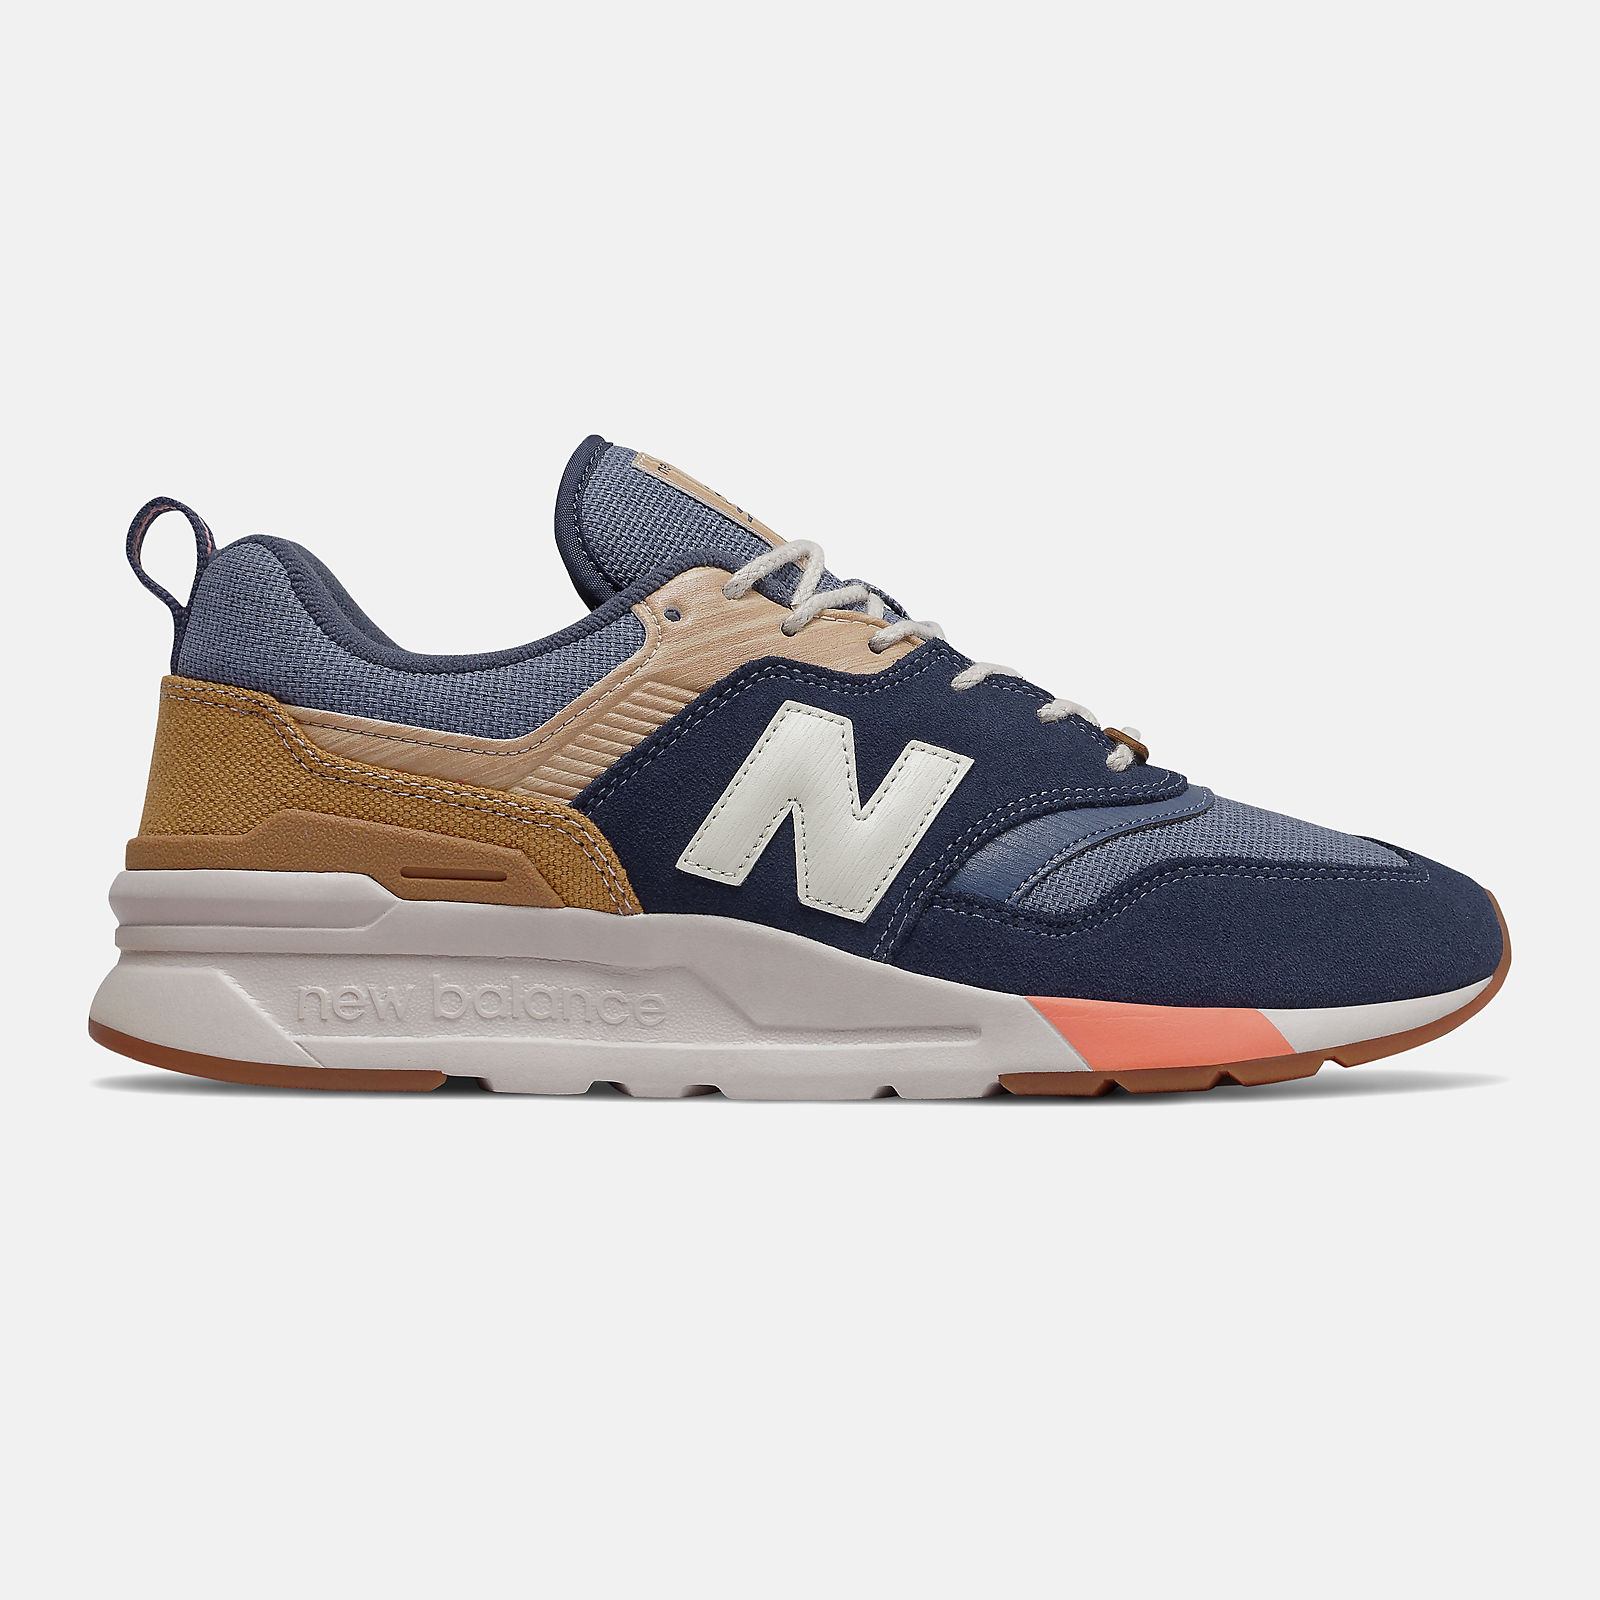 new balance 977 h